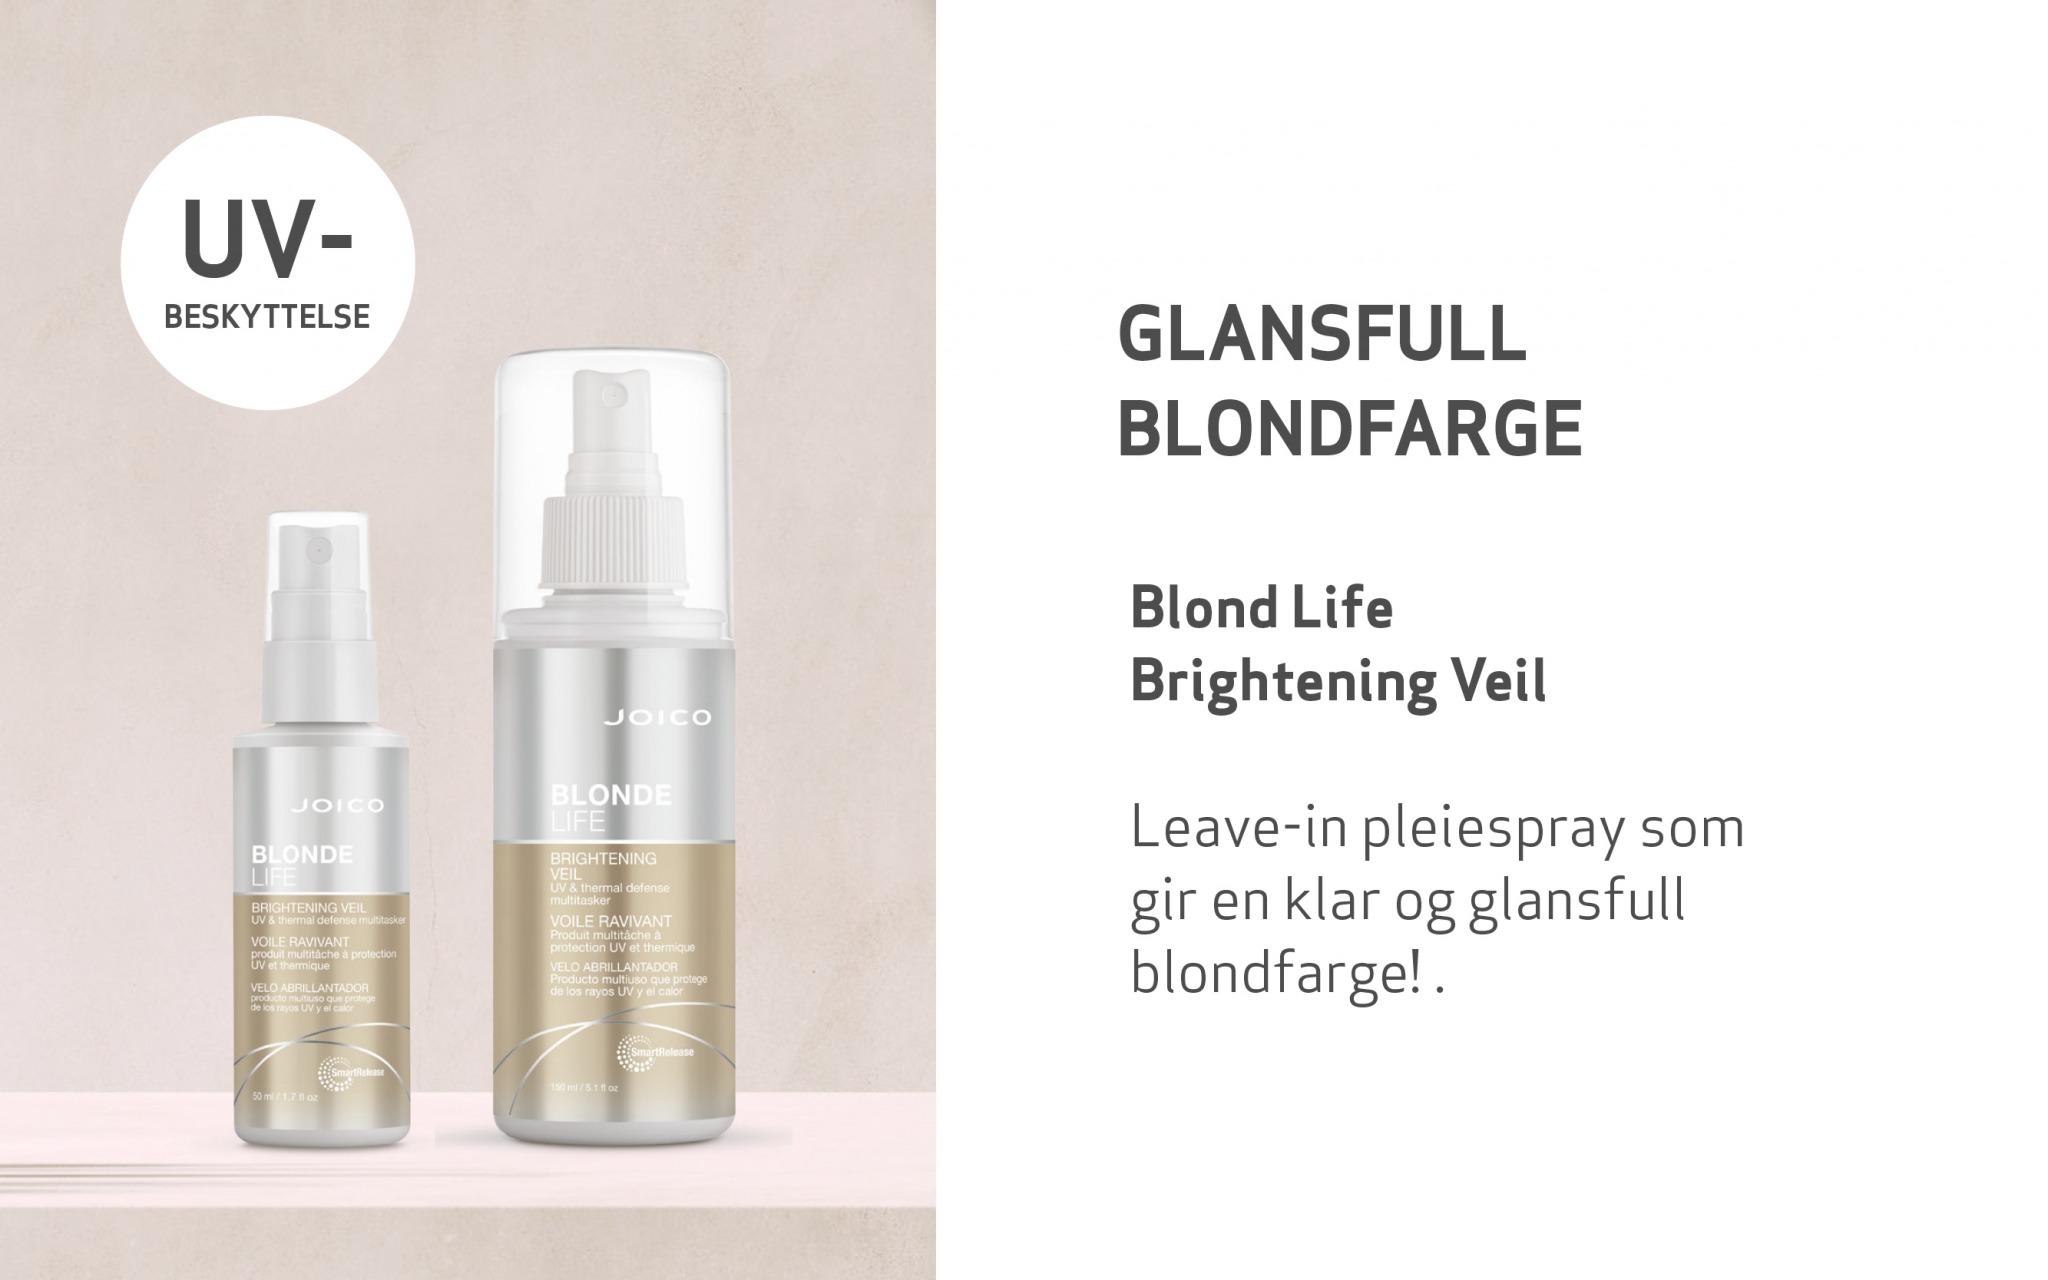 Hårprodukt Blond Life Brightening Veil i to størrelser